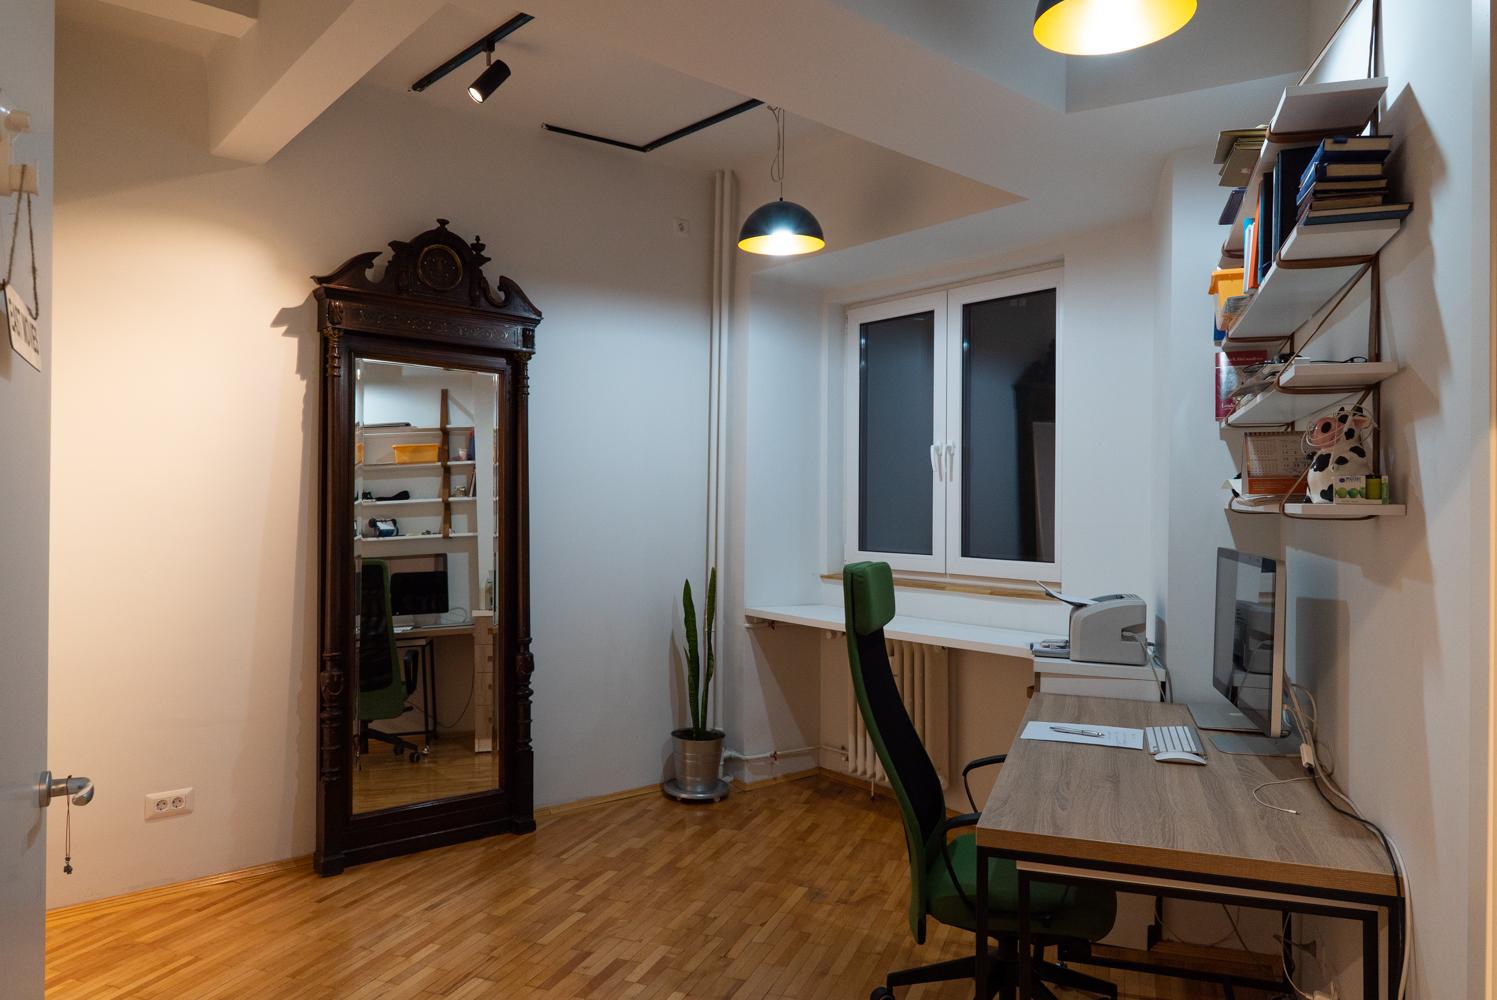 Renovare apartament vechi Universitate - birou Cristina